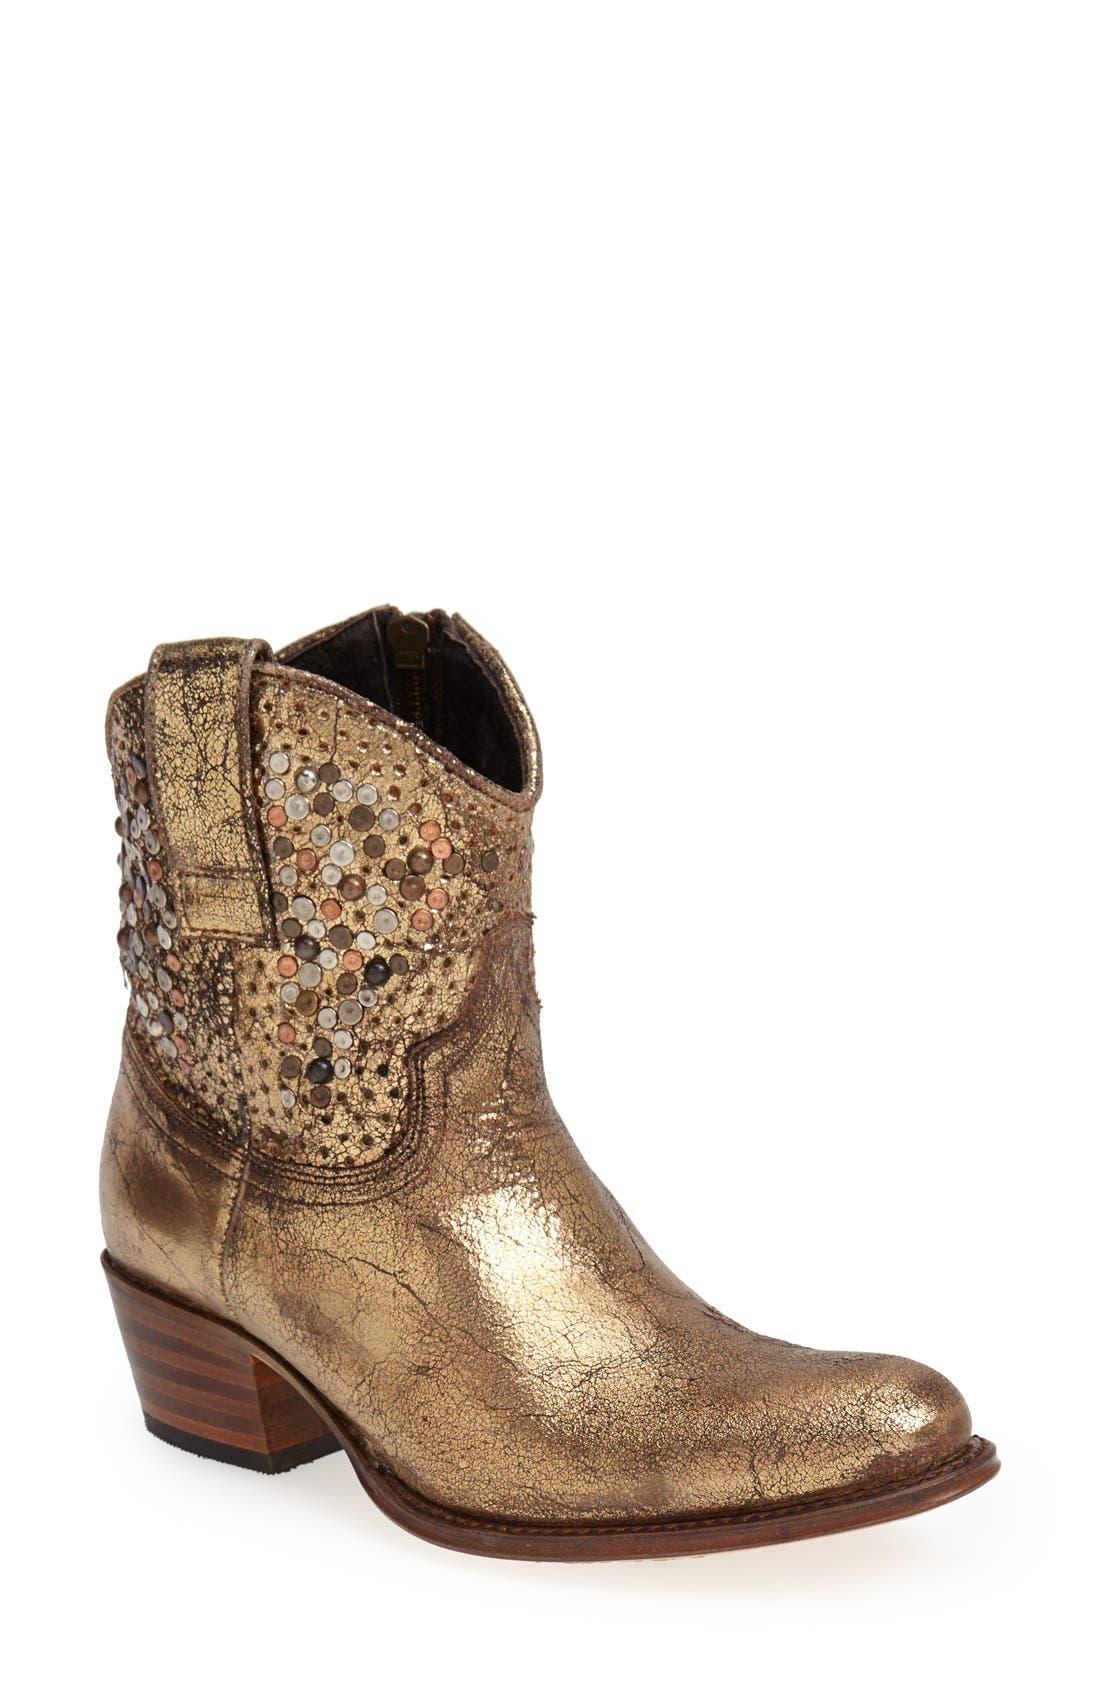 Main Image - Frye 'Deborah' Studded Ankle Boot